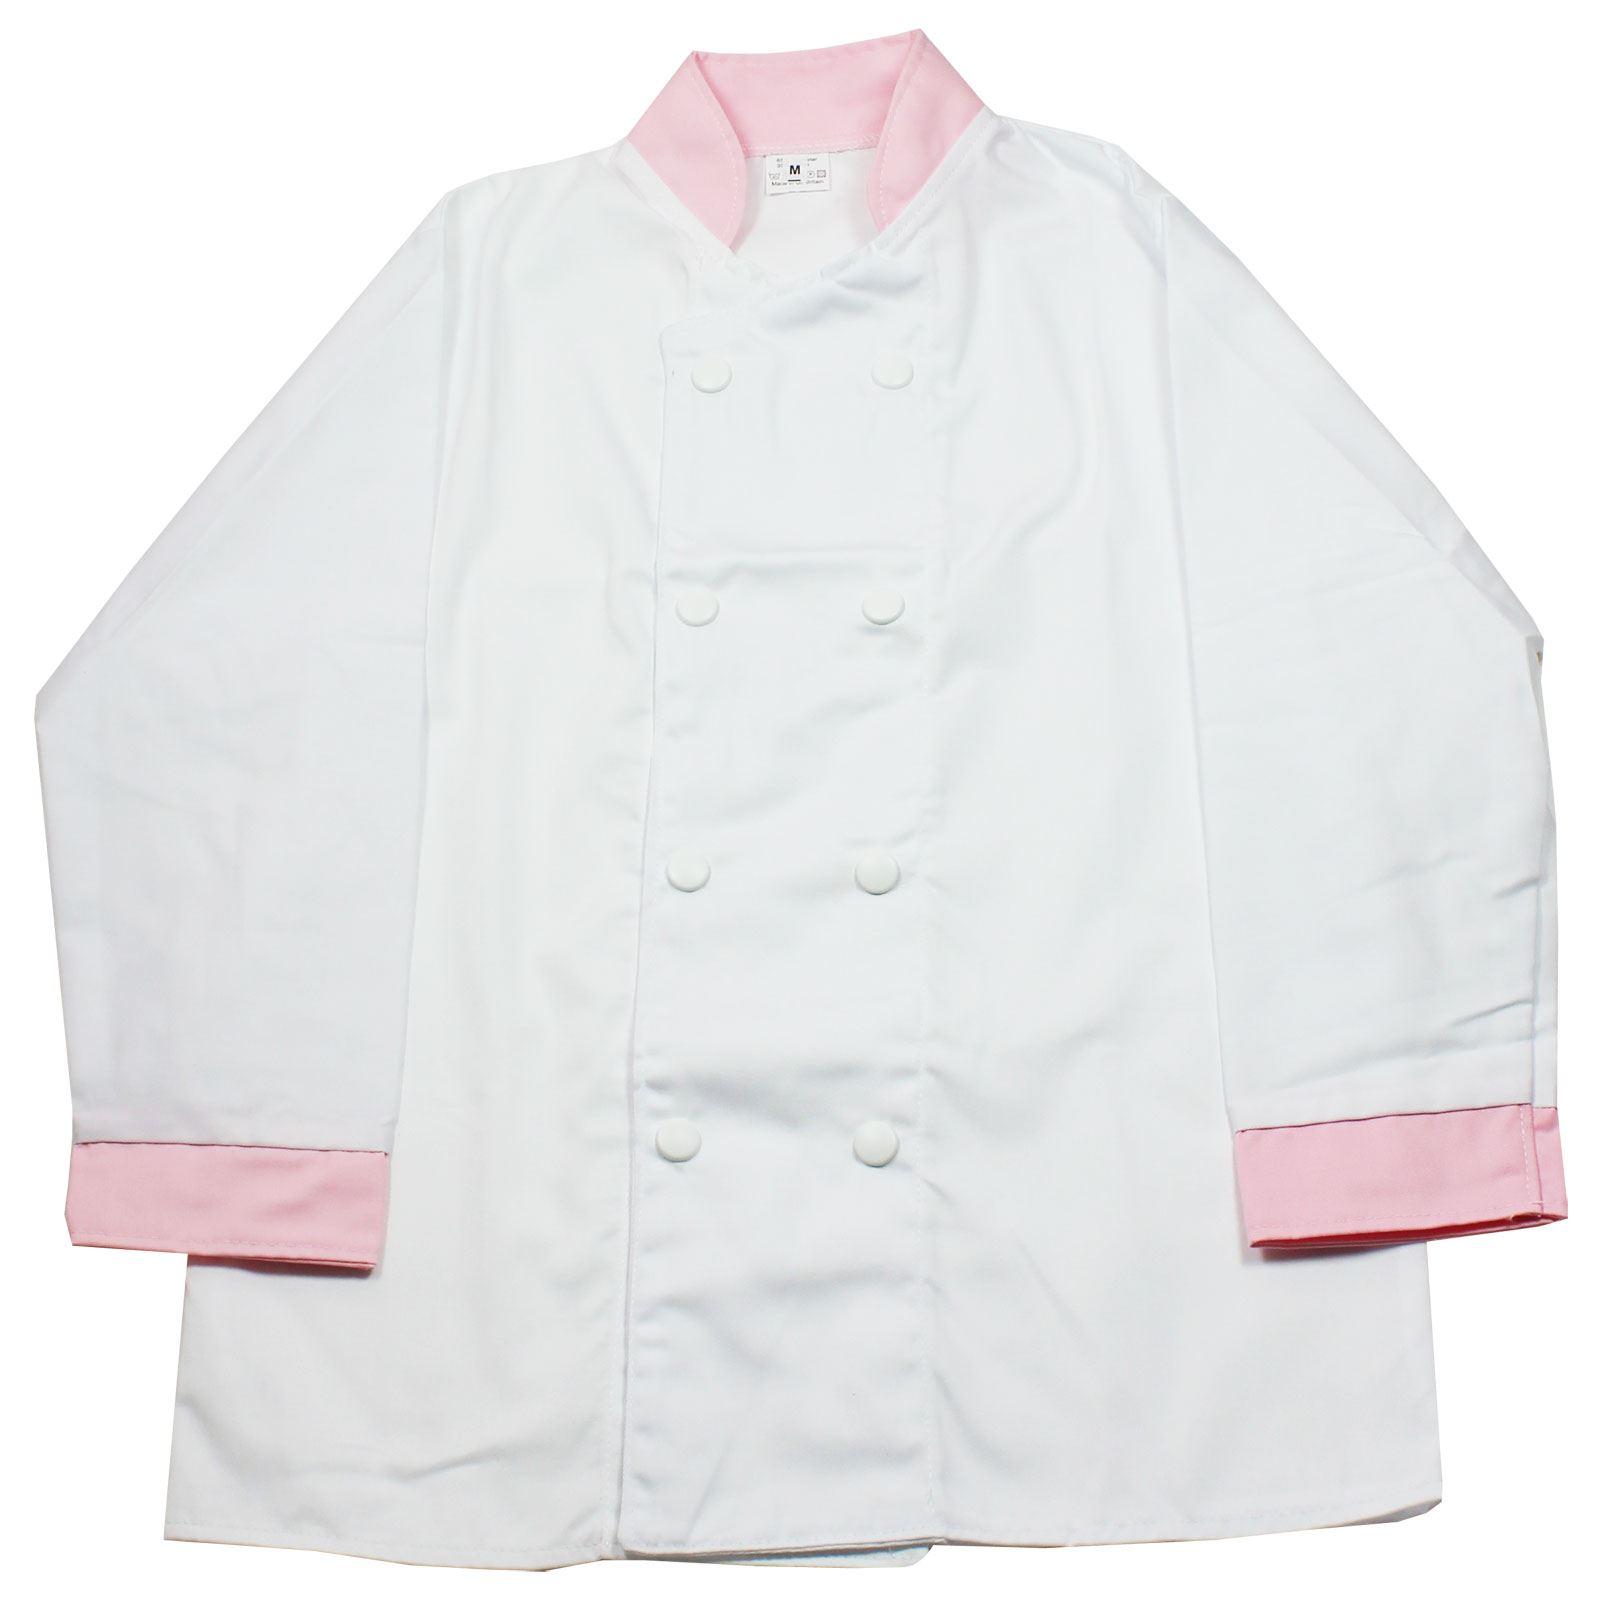 Children's Junior Chefs Jackets for Kids Cooking School Uniforms ...